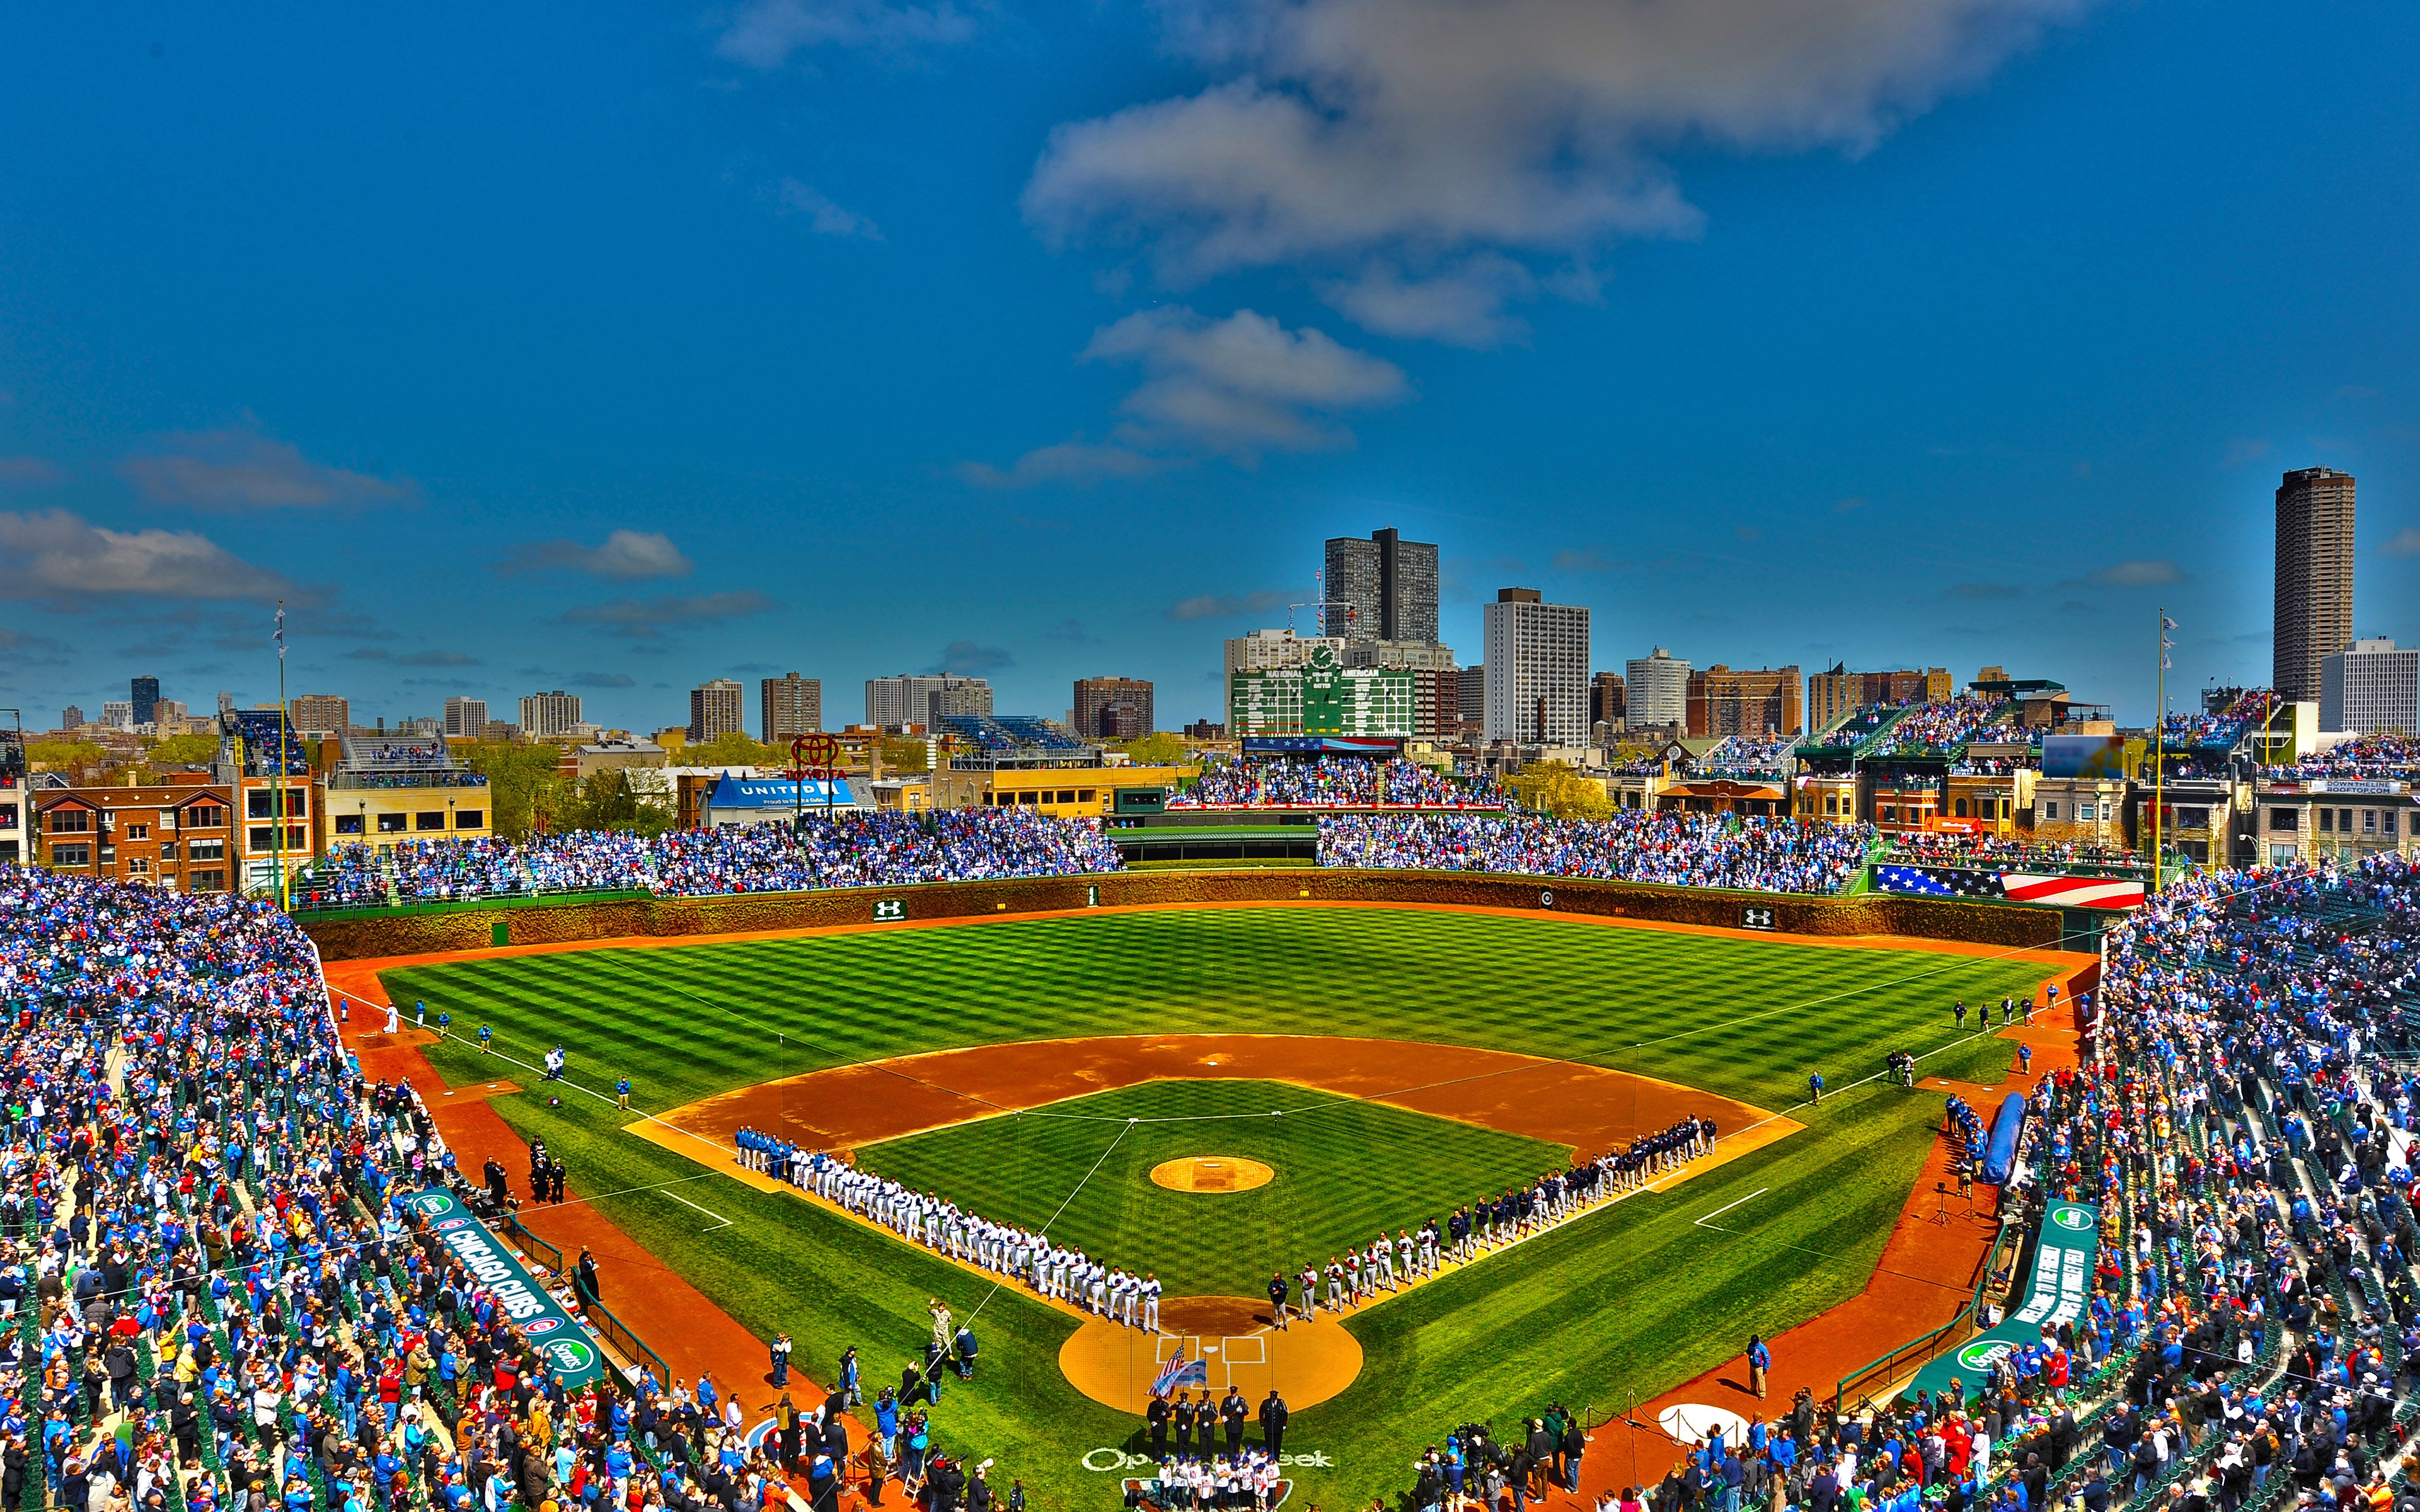 Chicago Cubs Ballpark Wrigley Field Chicago Illinois Wallpaper Wrigley Field Chicago Wrigley Field Chicago Illinois